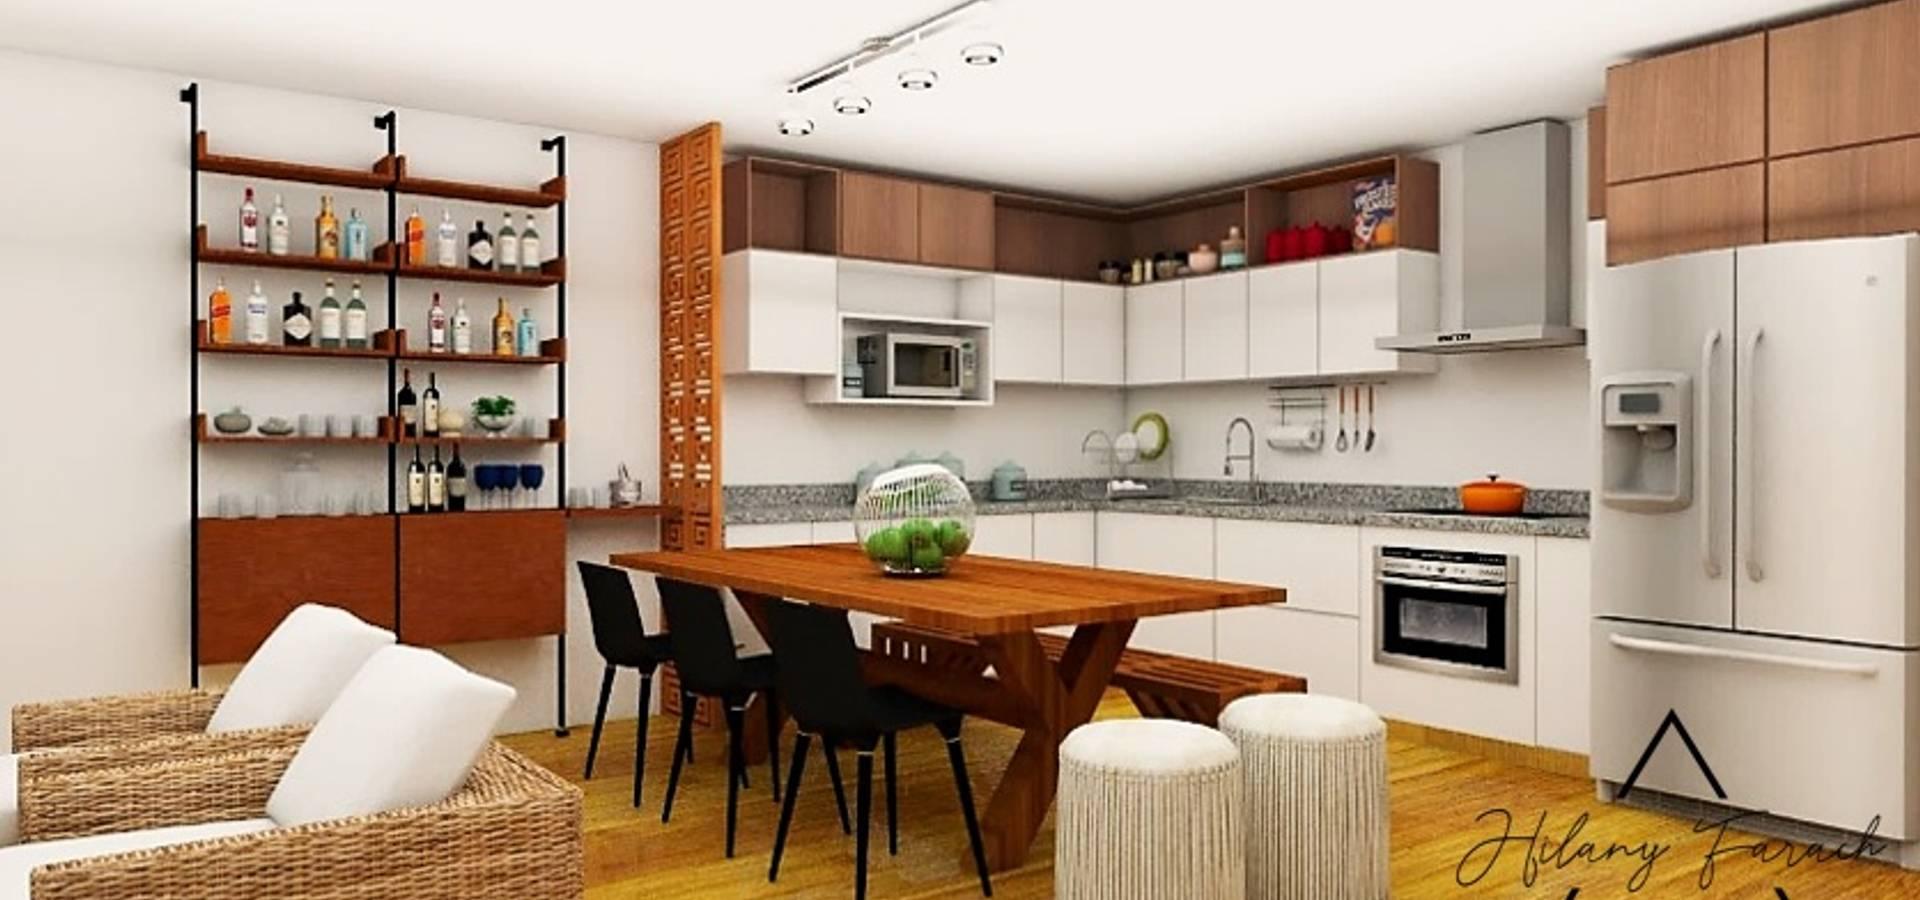 Farach Interior Design